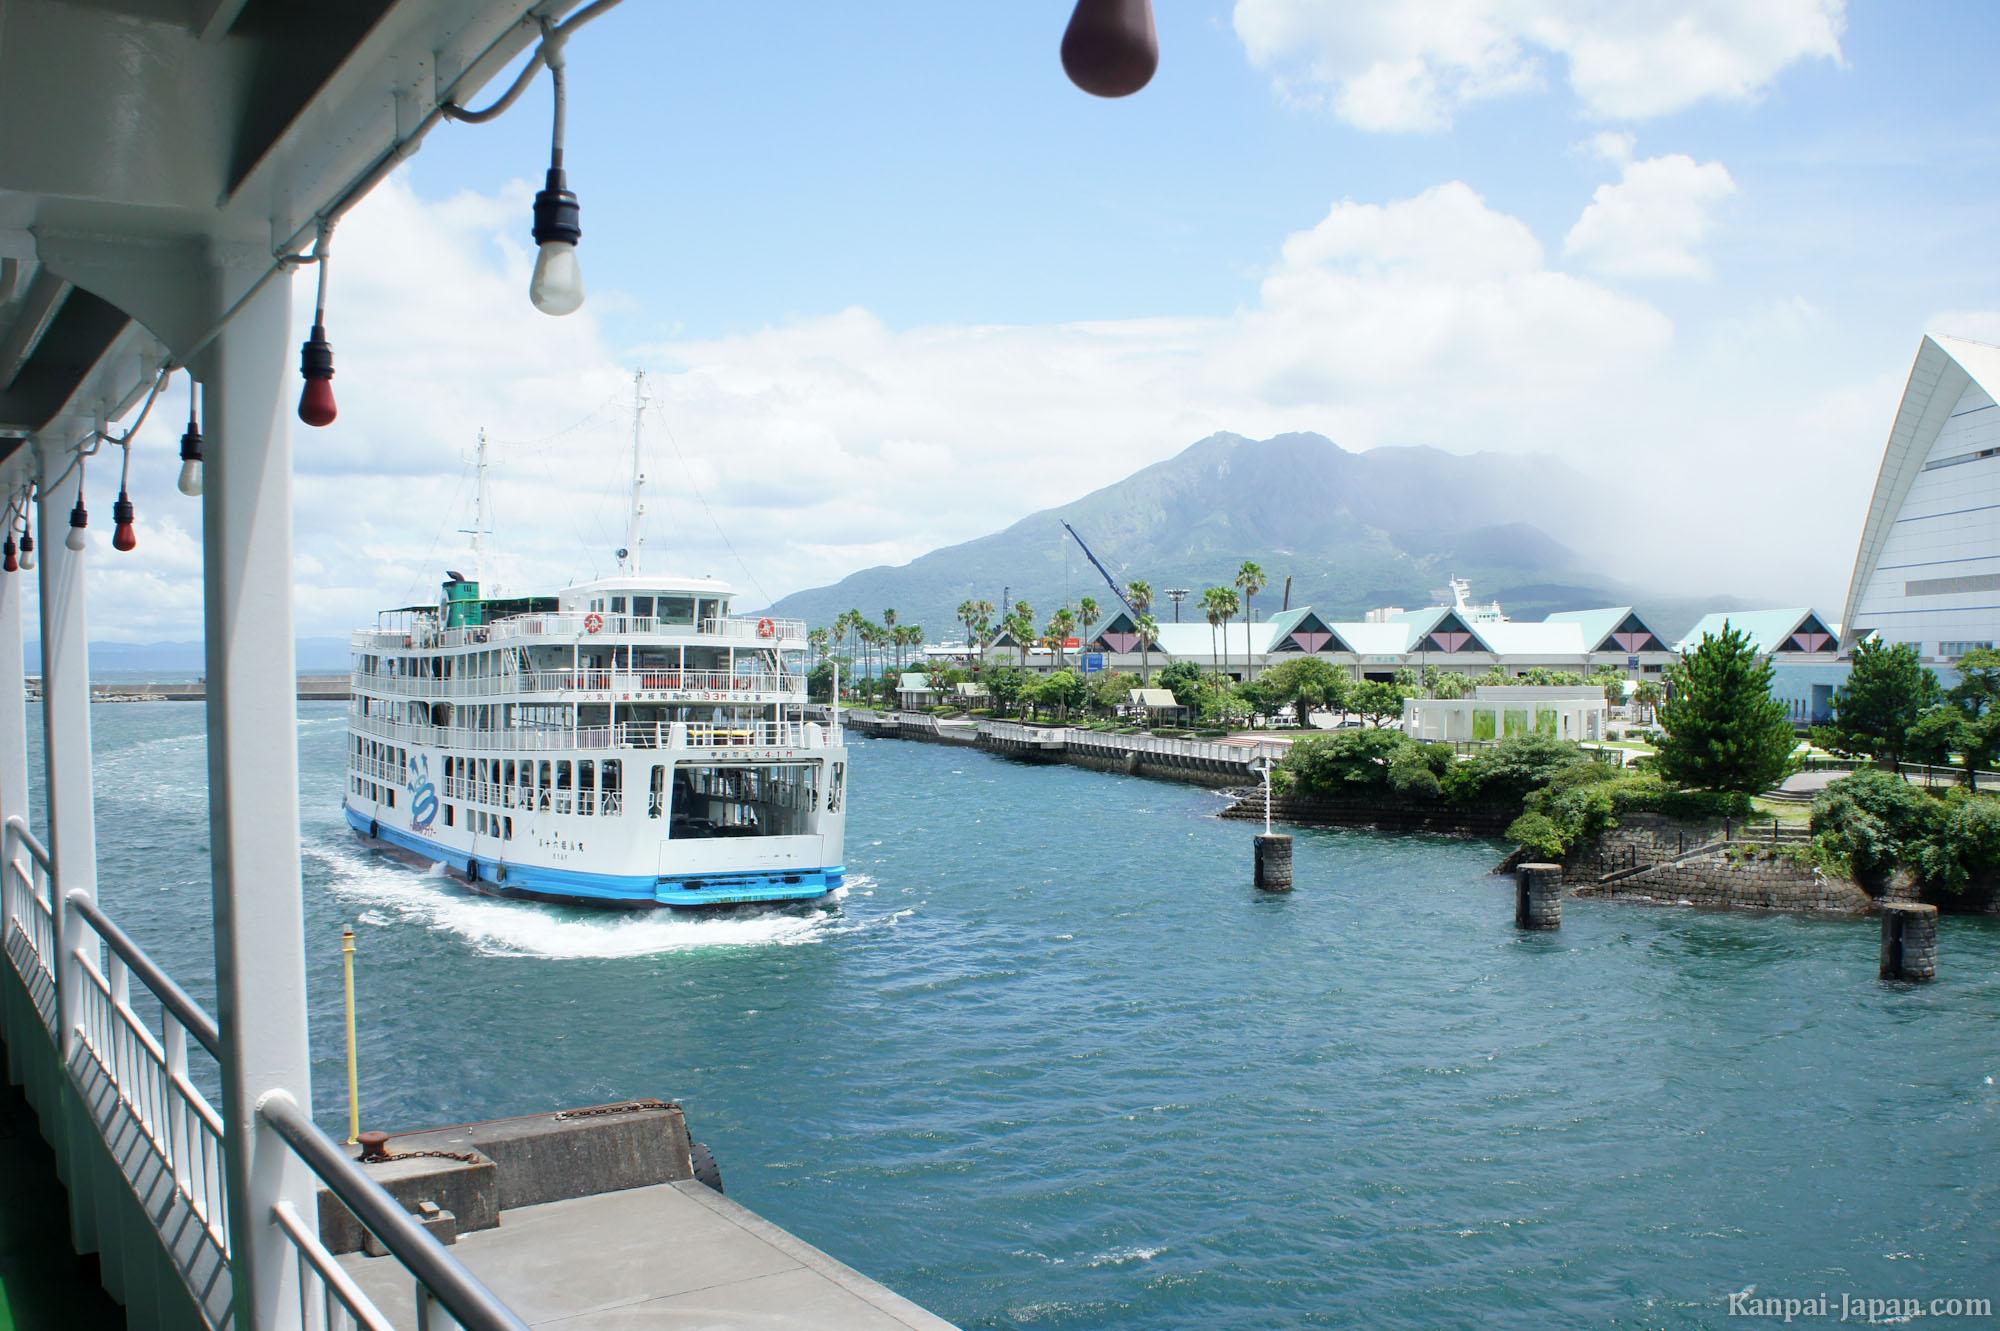 kagoshima singles Sun days inn kagoshima in kagoshima on hotelscom and earn rewards nights collect 10 nights get 1 free read 102 genuine guest reviews for sun days inn kagoshima.